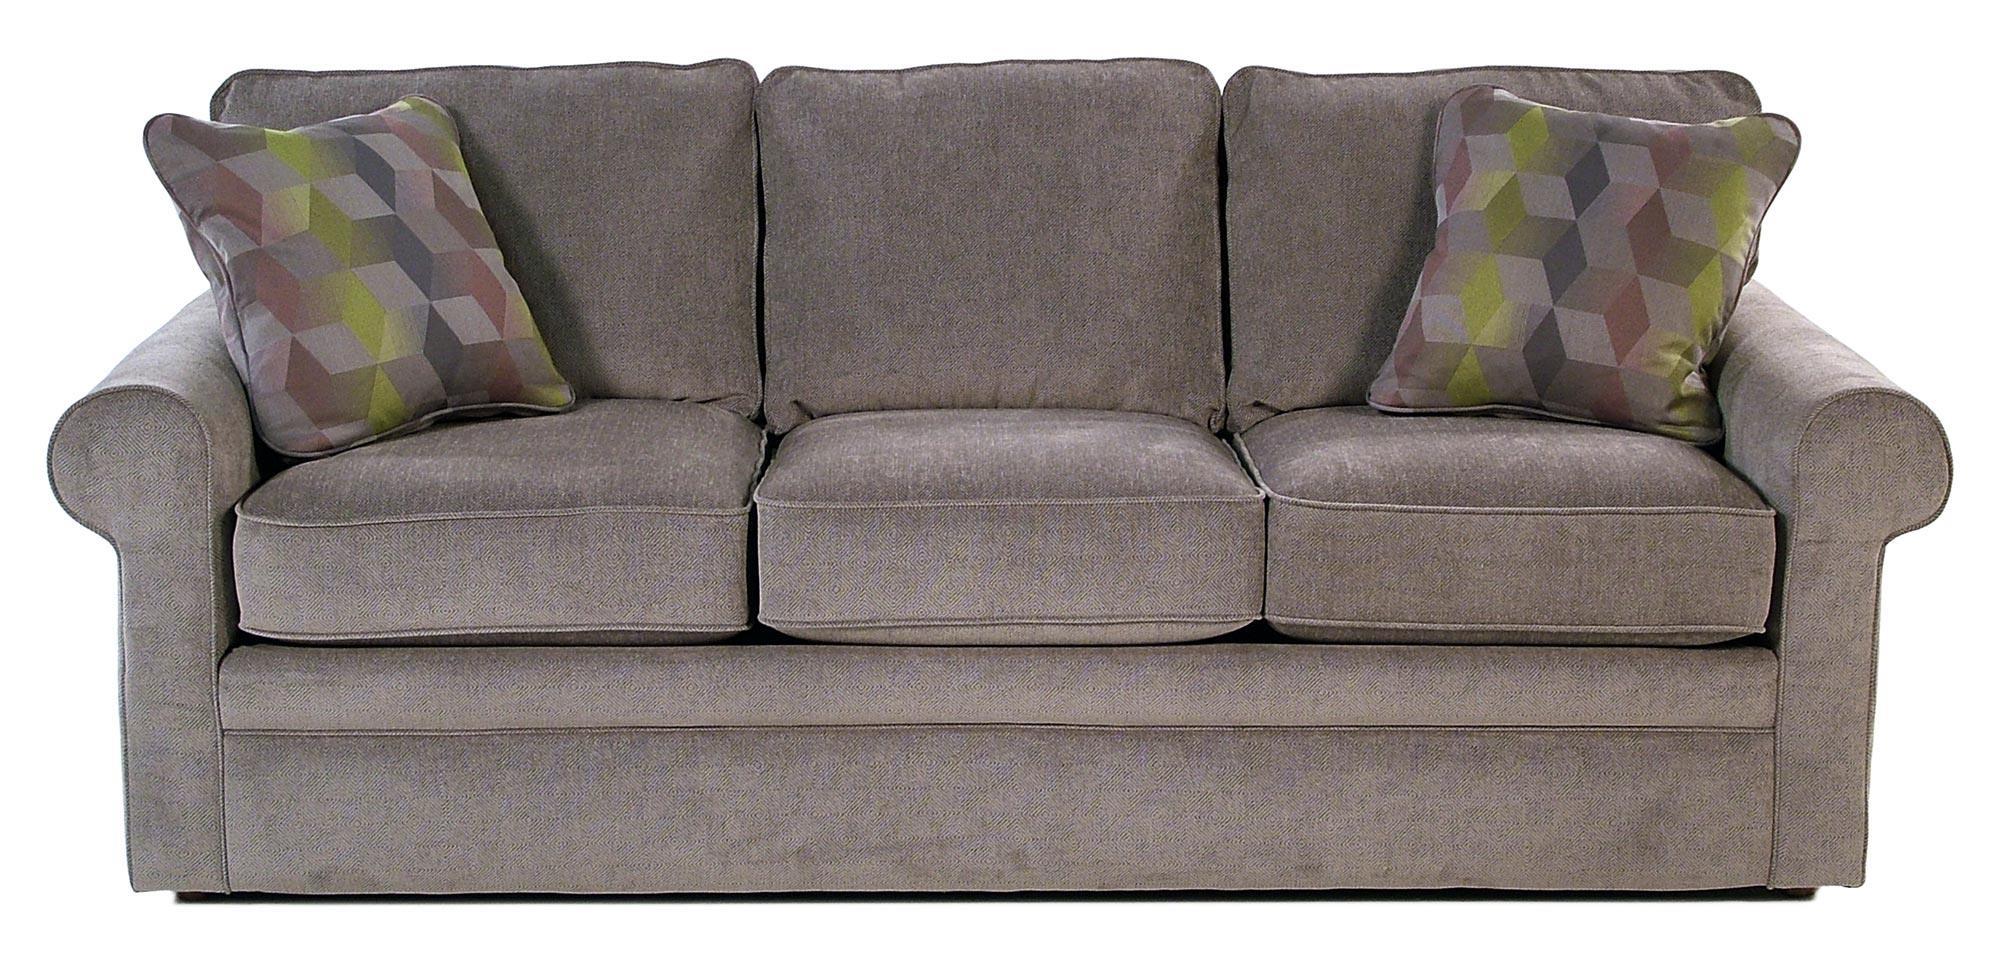 Lazy boy collins sofa collins 494 by la z boy ad furniture for Lazy boy collins sectional sofa